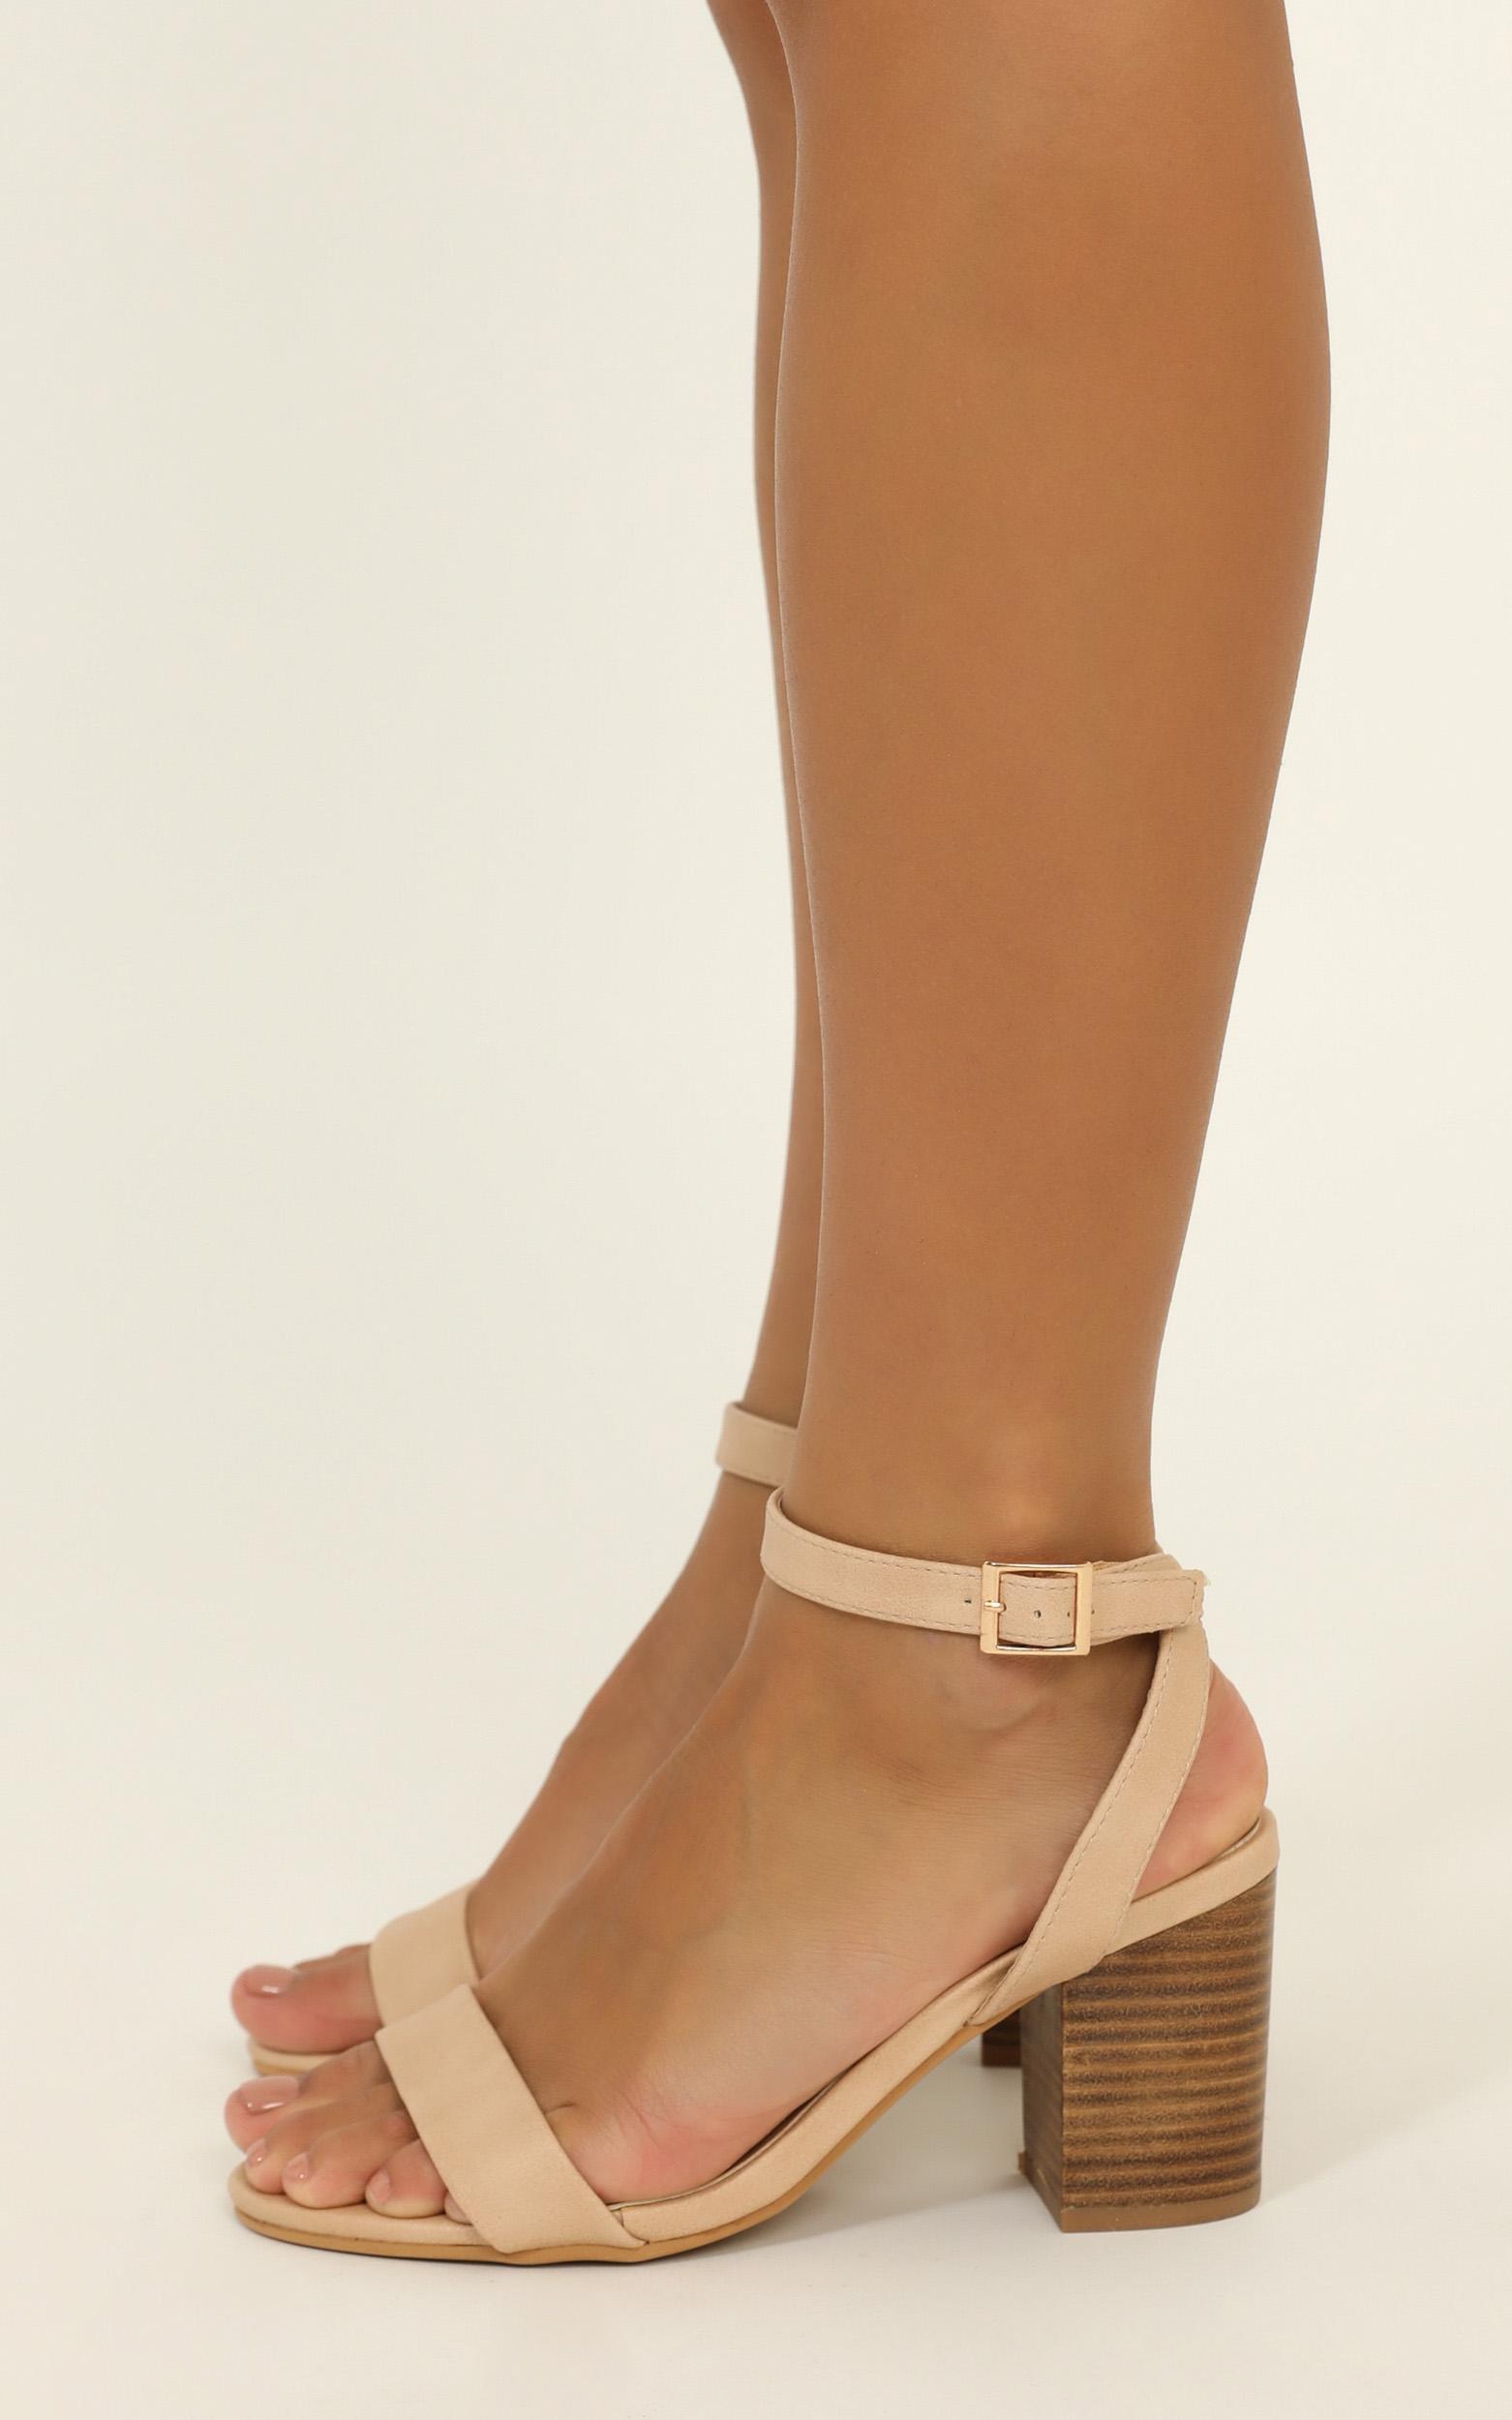 Billini - Carlina heels in nude - 5, Brown, hi-res image number null